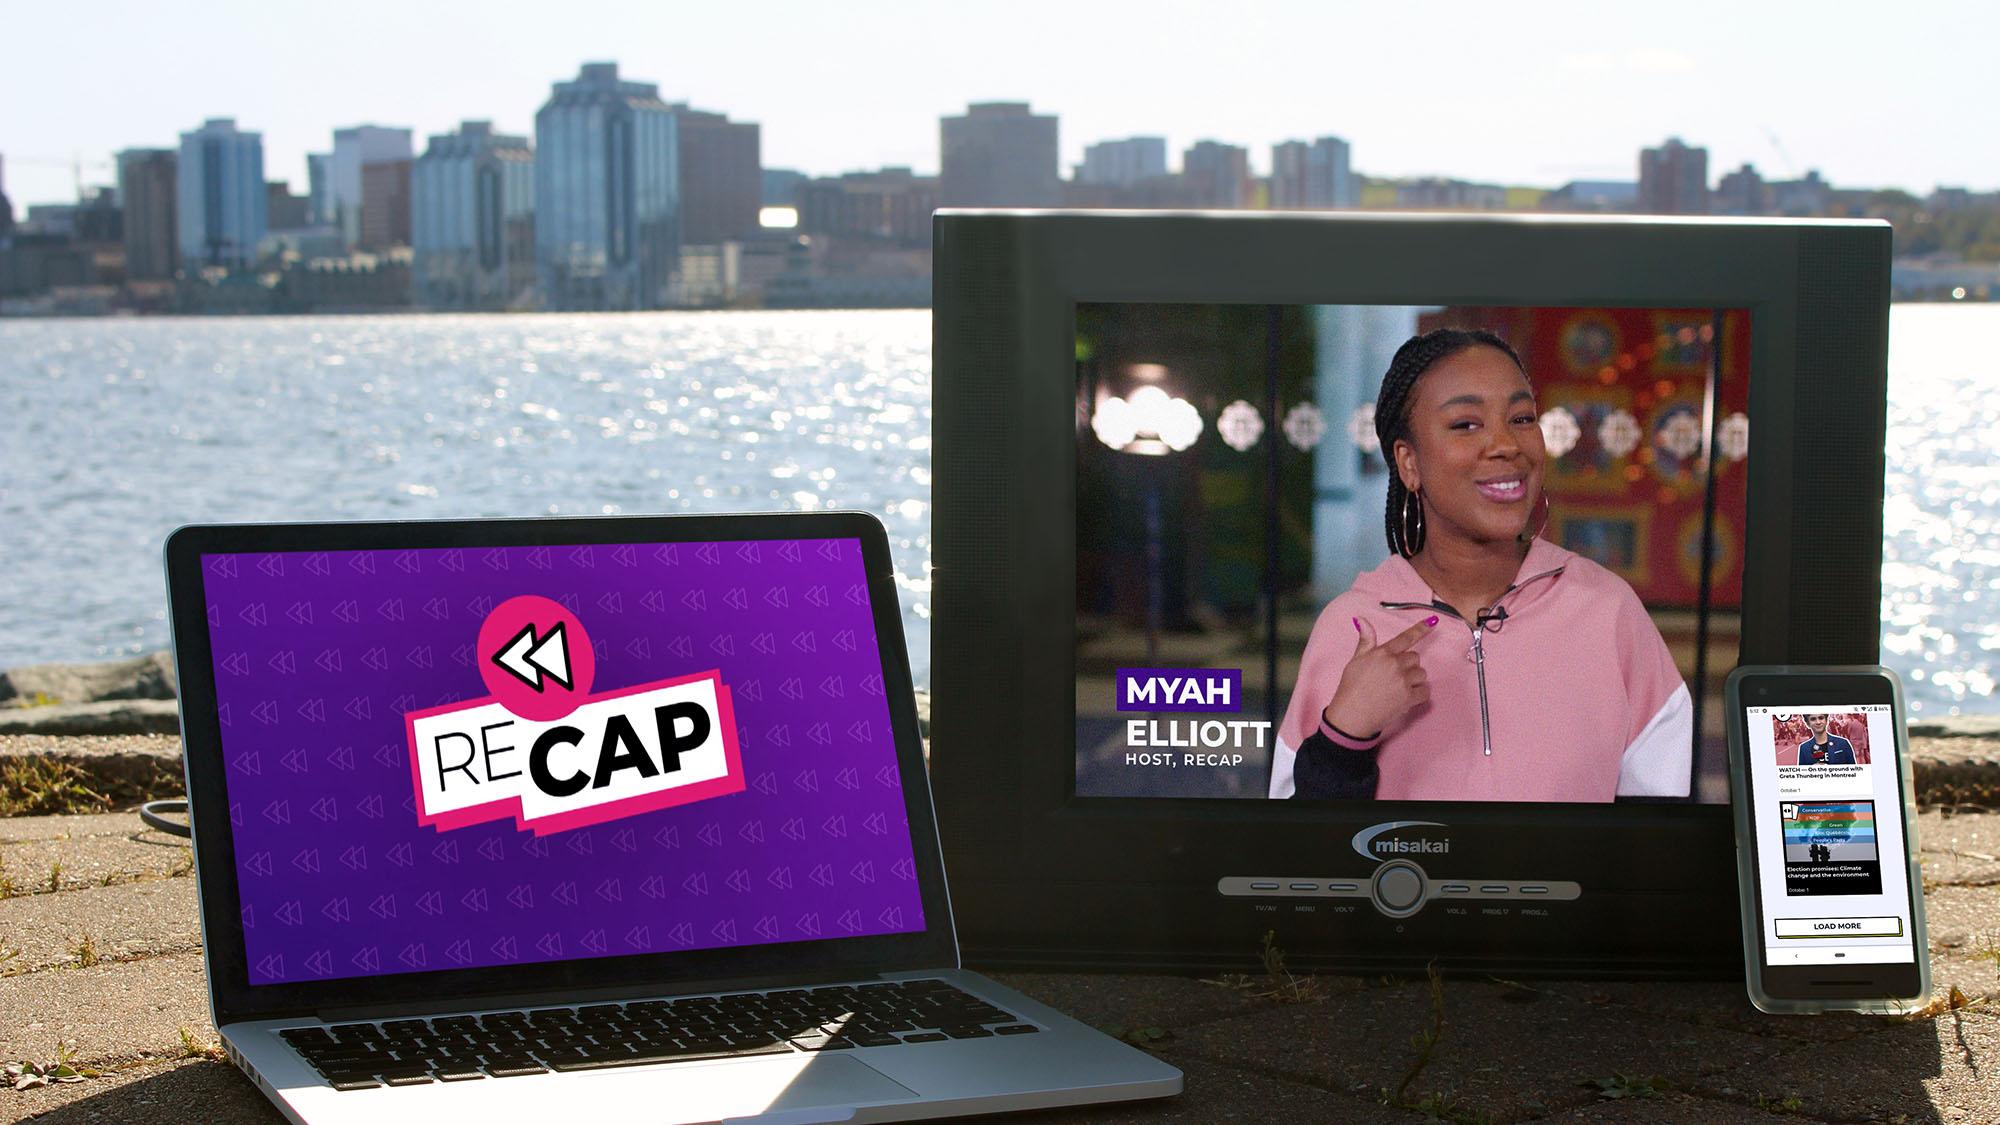 Recap is hosted by Myah Elliott.